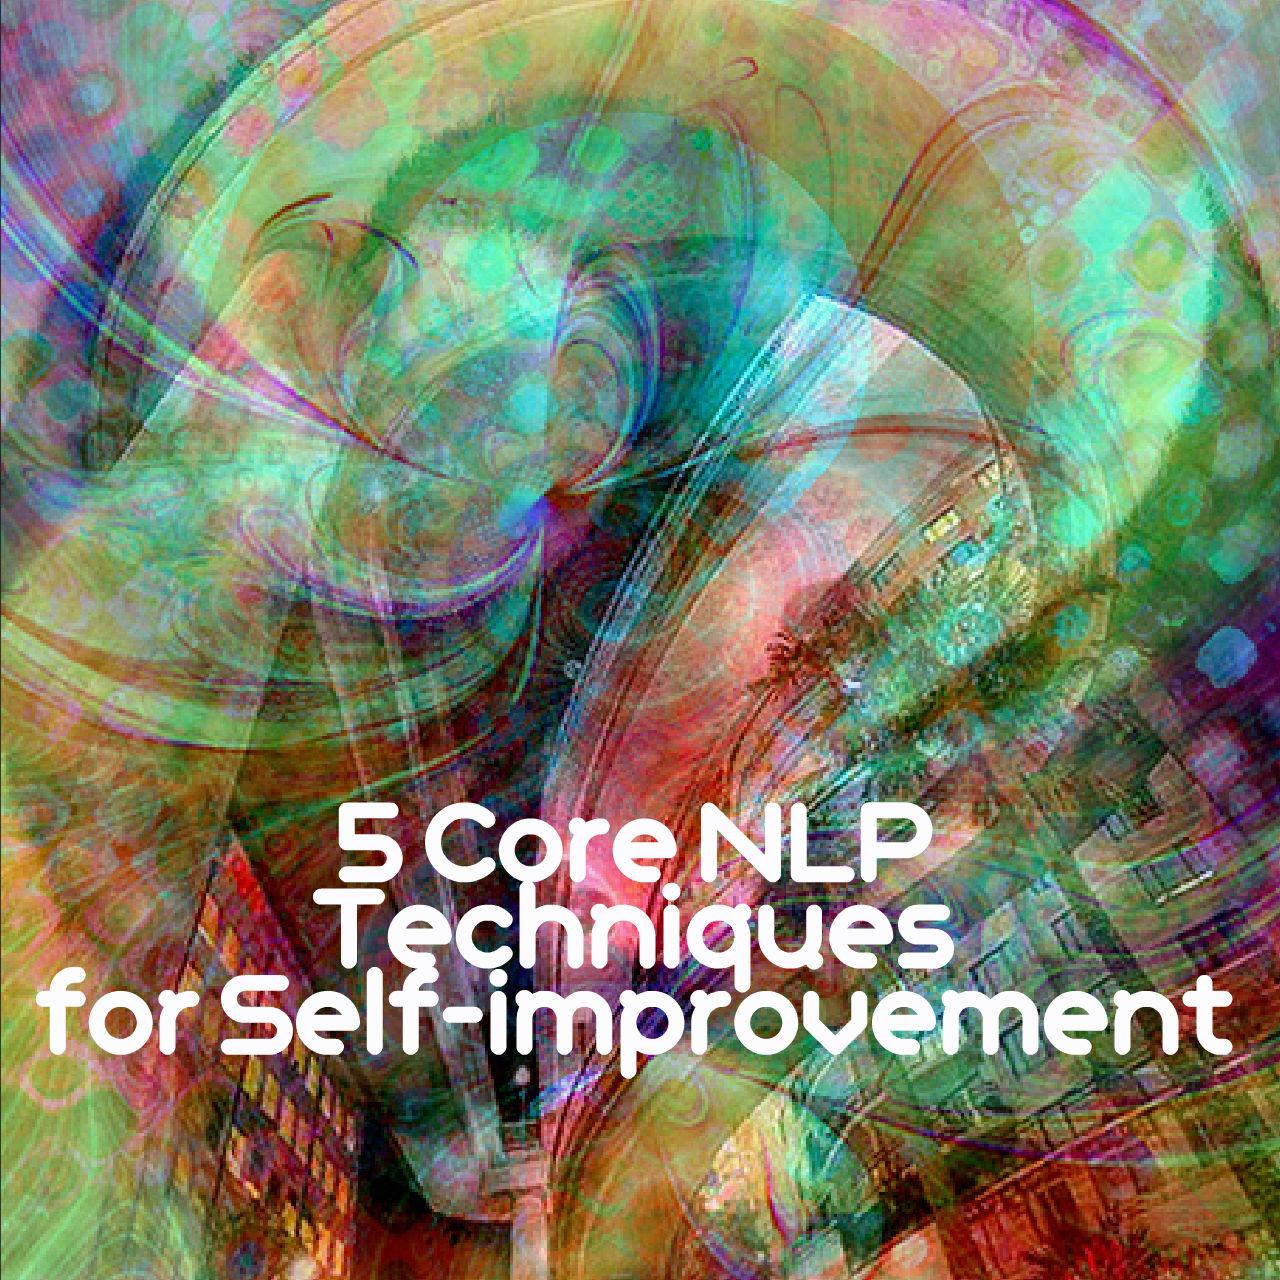 Five Core NLP Techniques For Self-improvement - Life Coach Hub